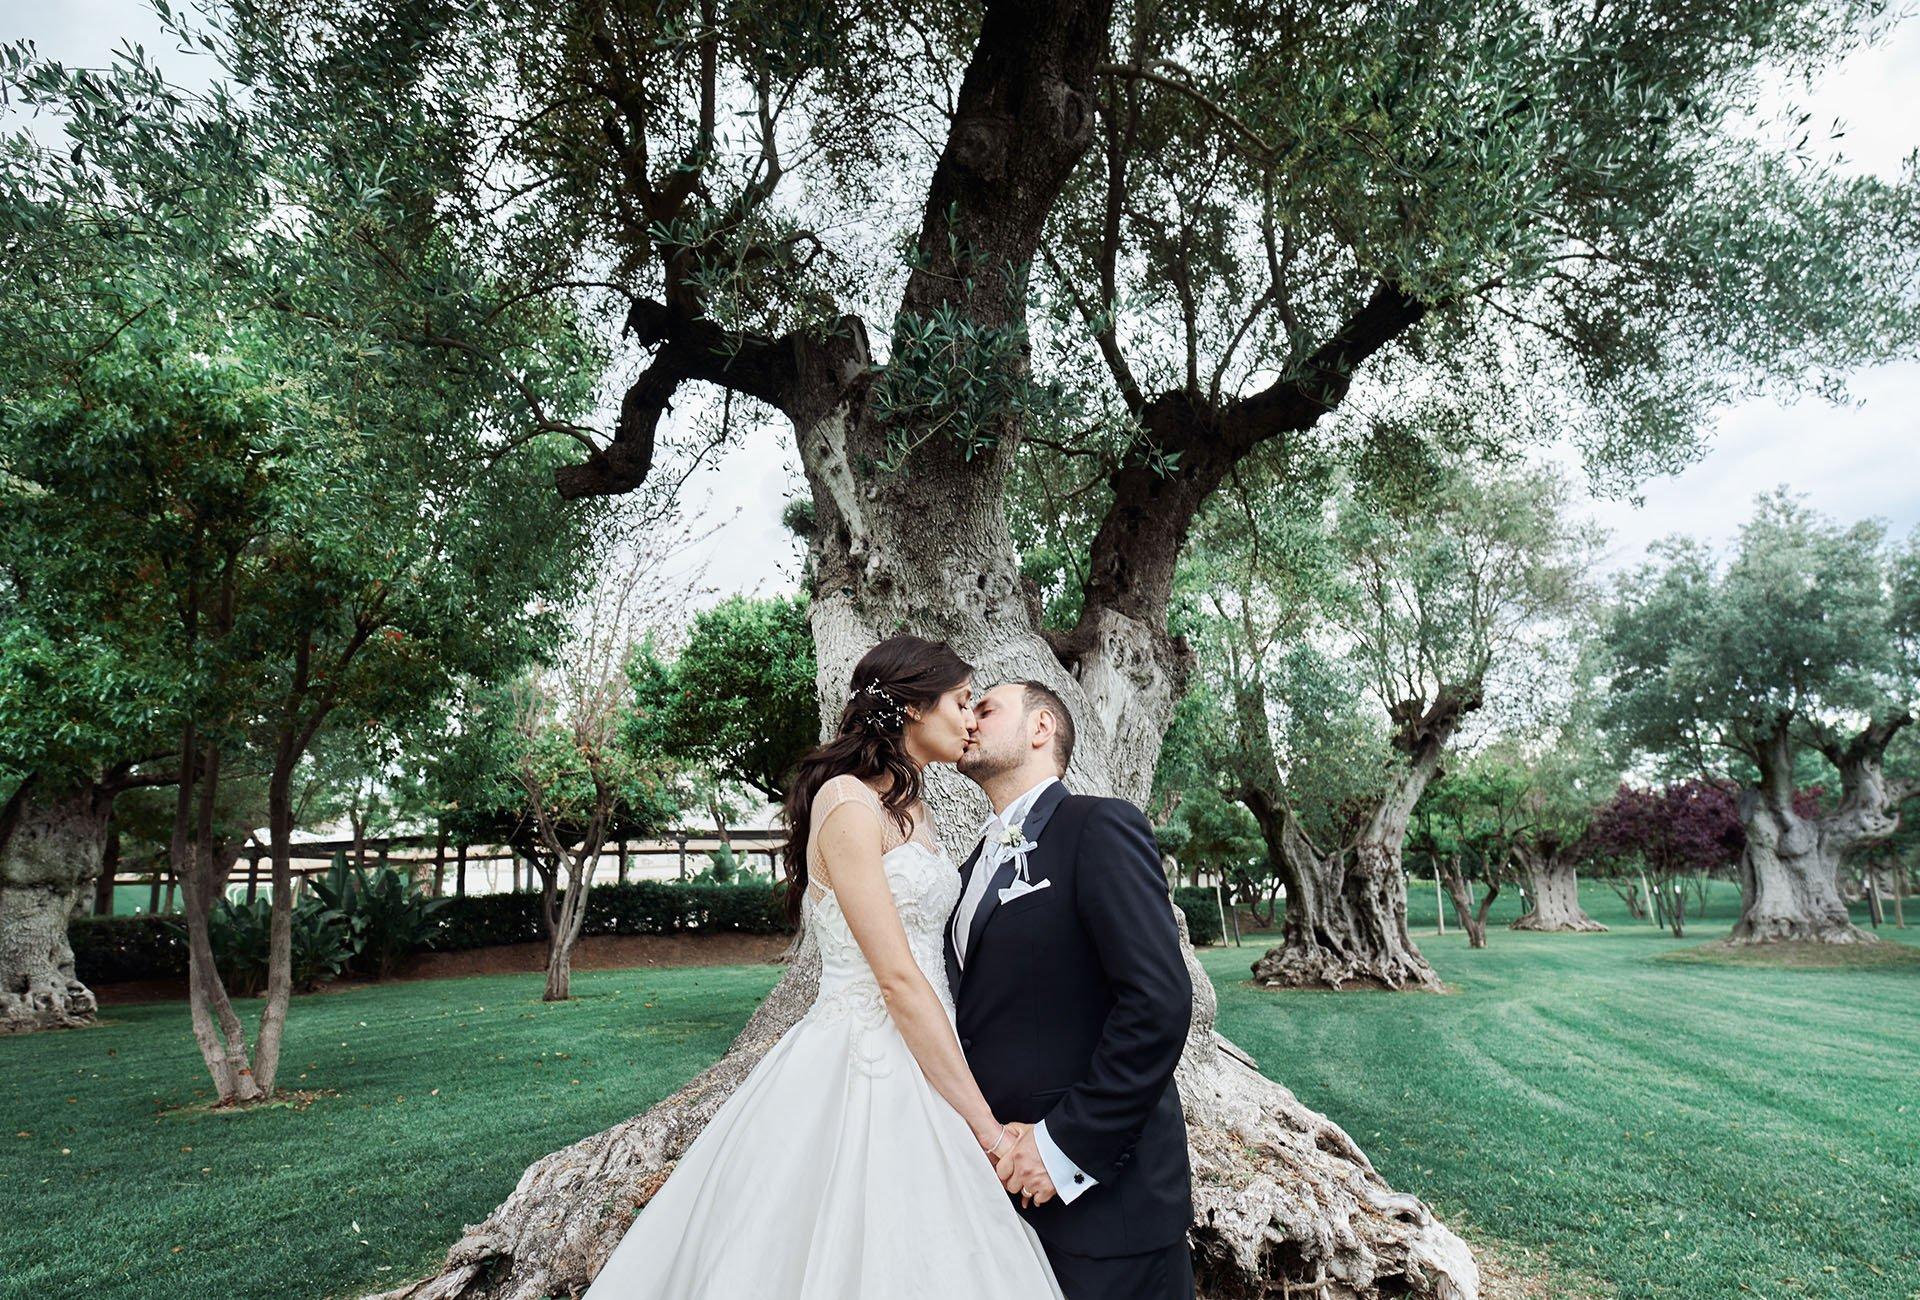 foto matrimonio matrimonio reggia dei tessali